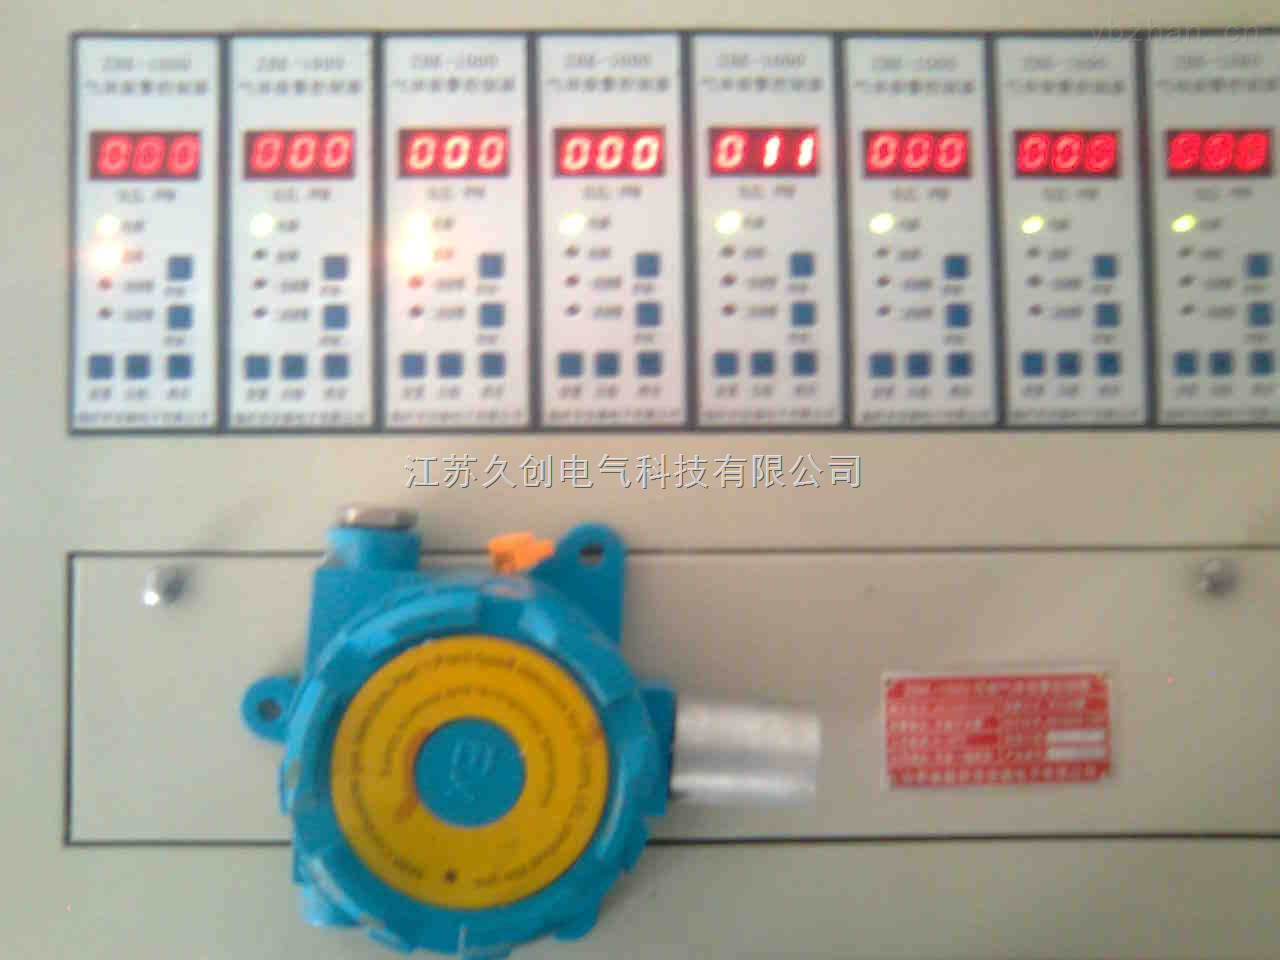 JC-QD633 气体探测器(带本地显示)